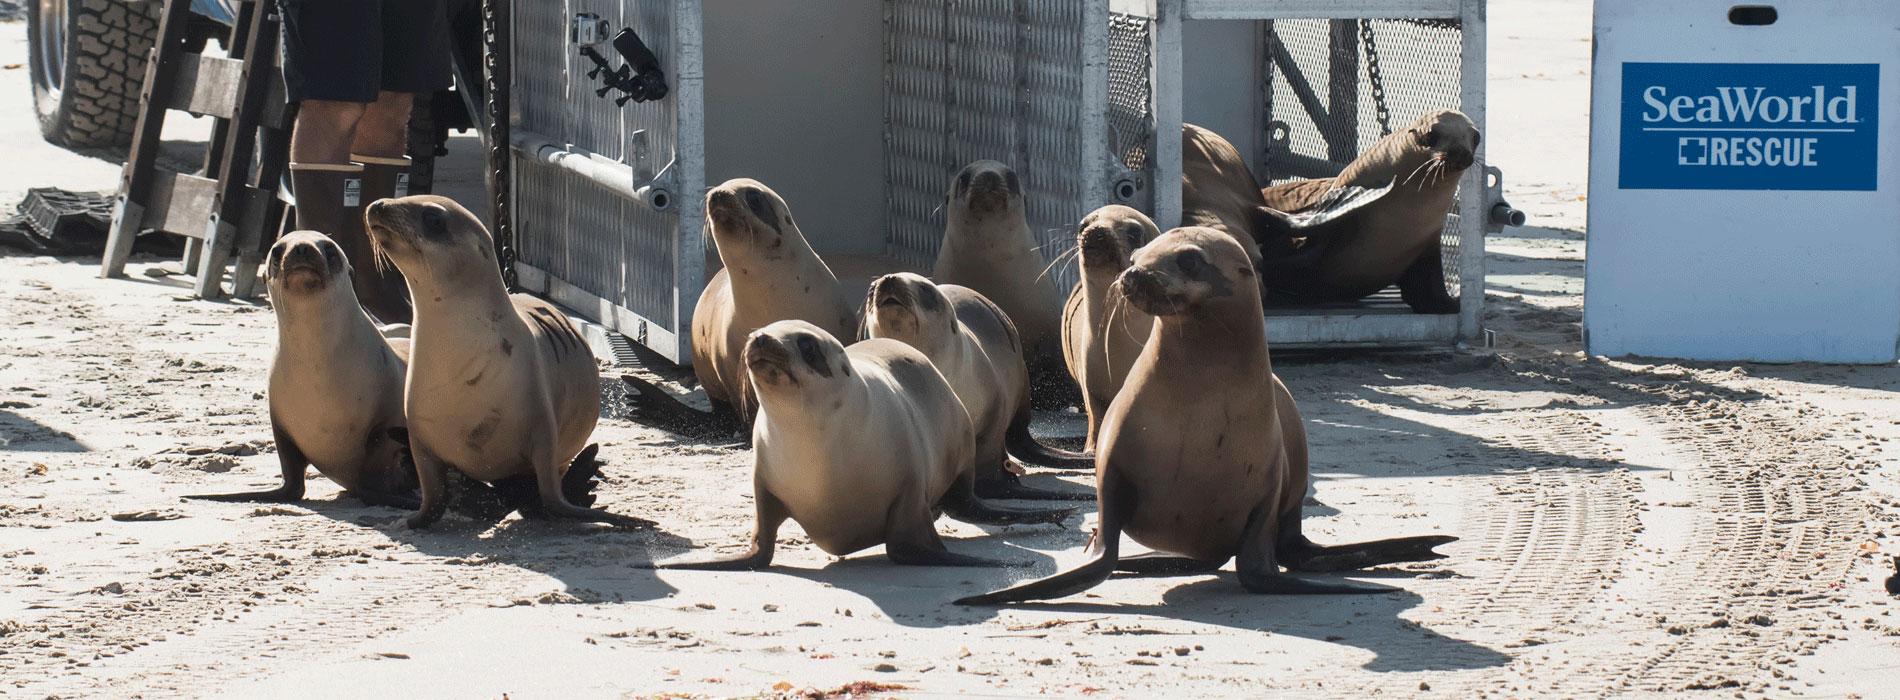 SeaWorld Blogs